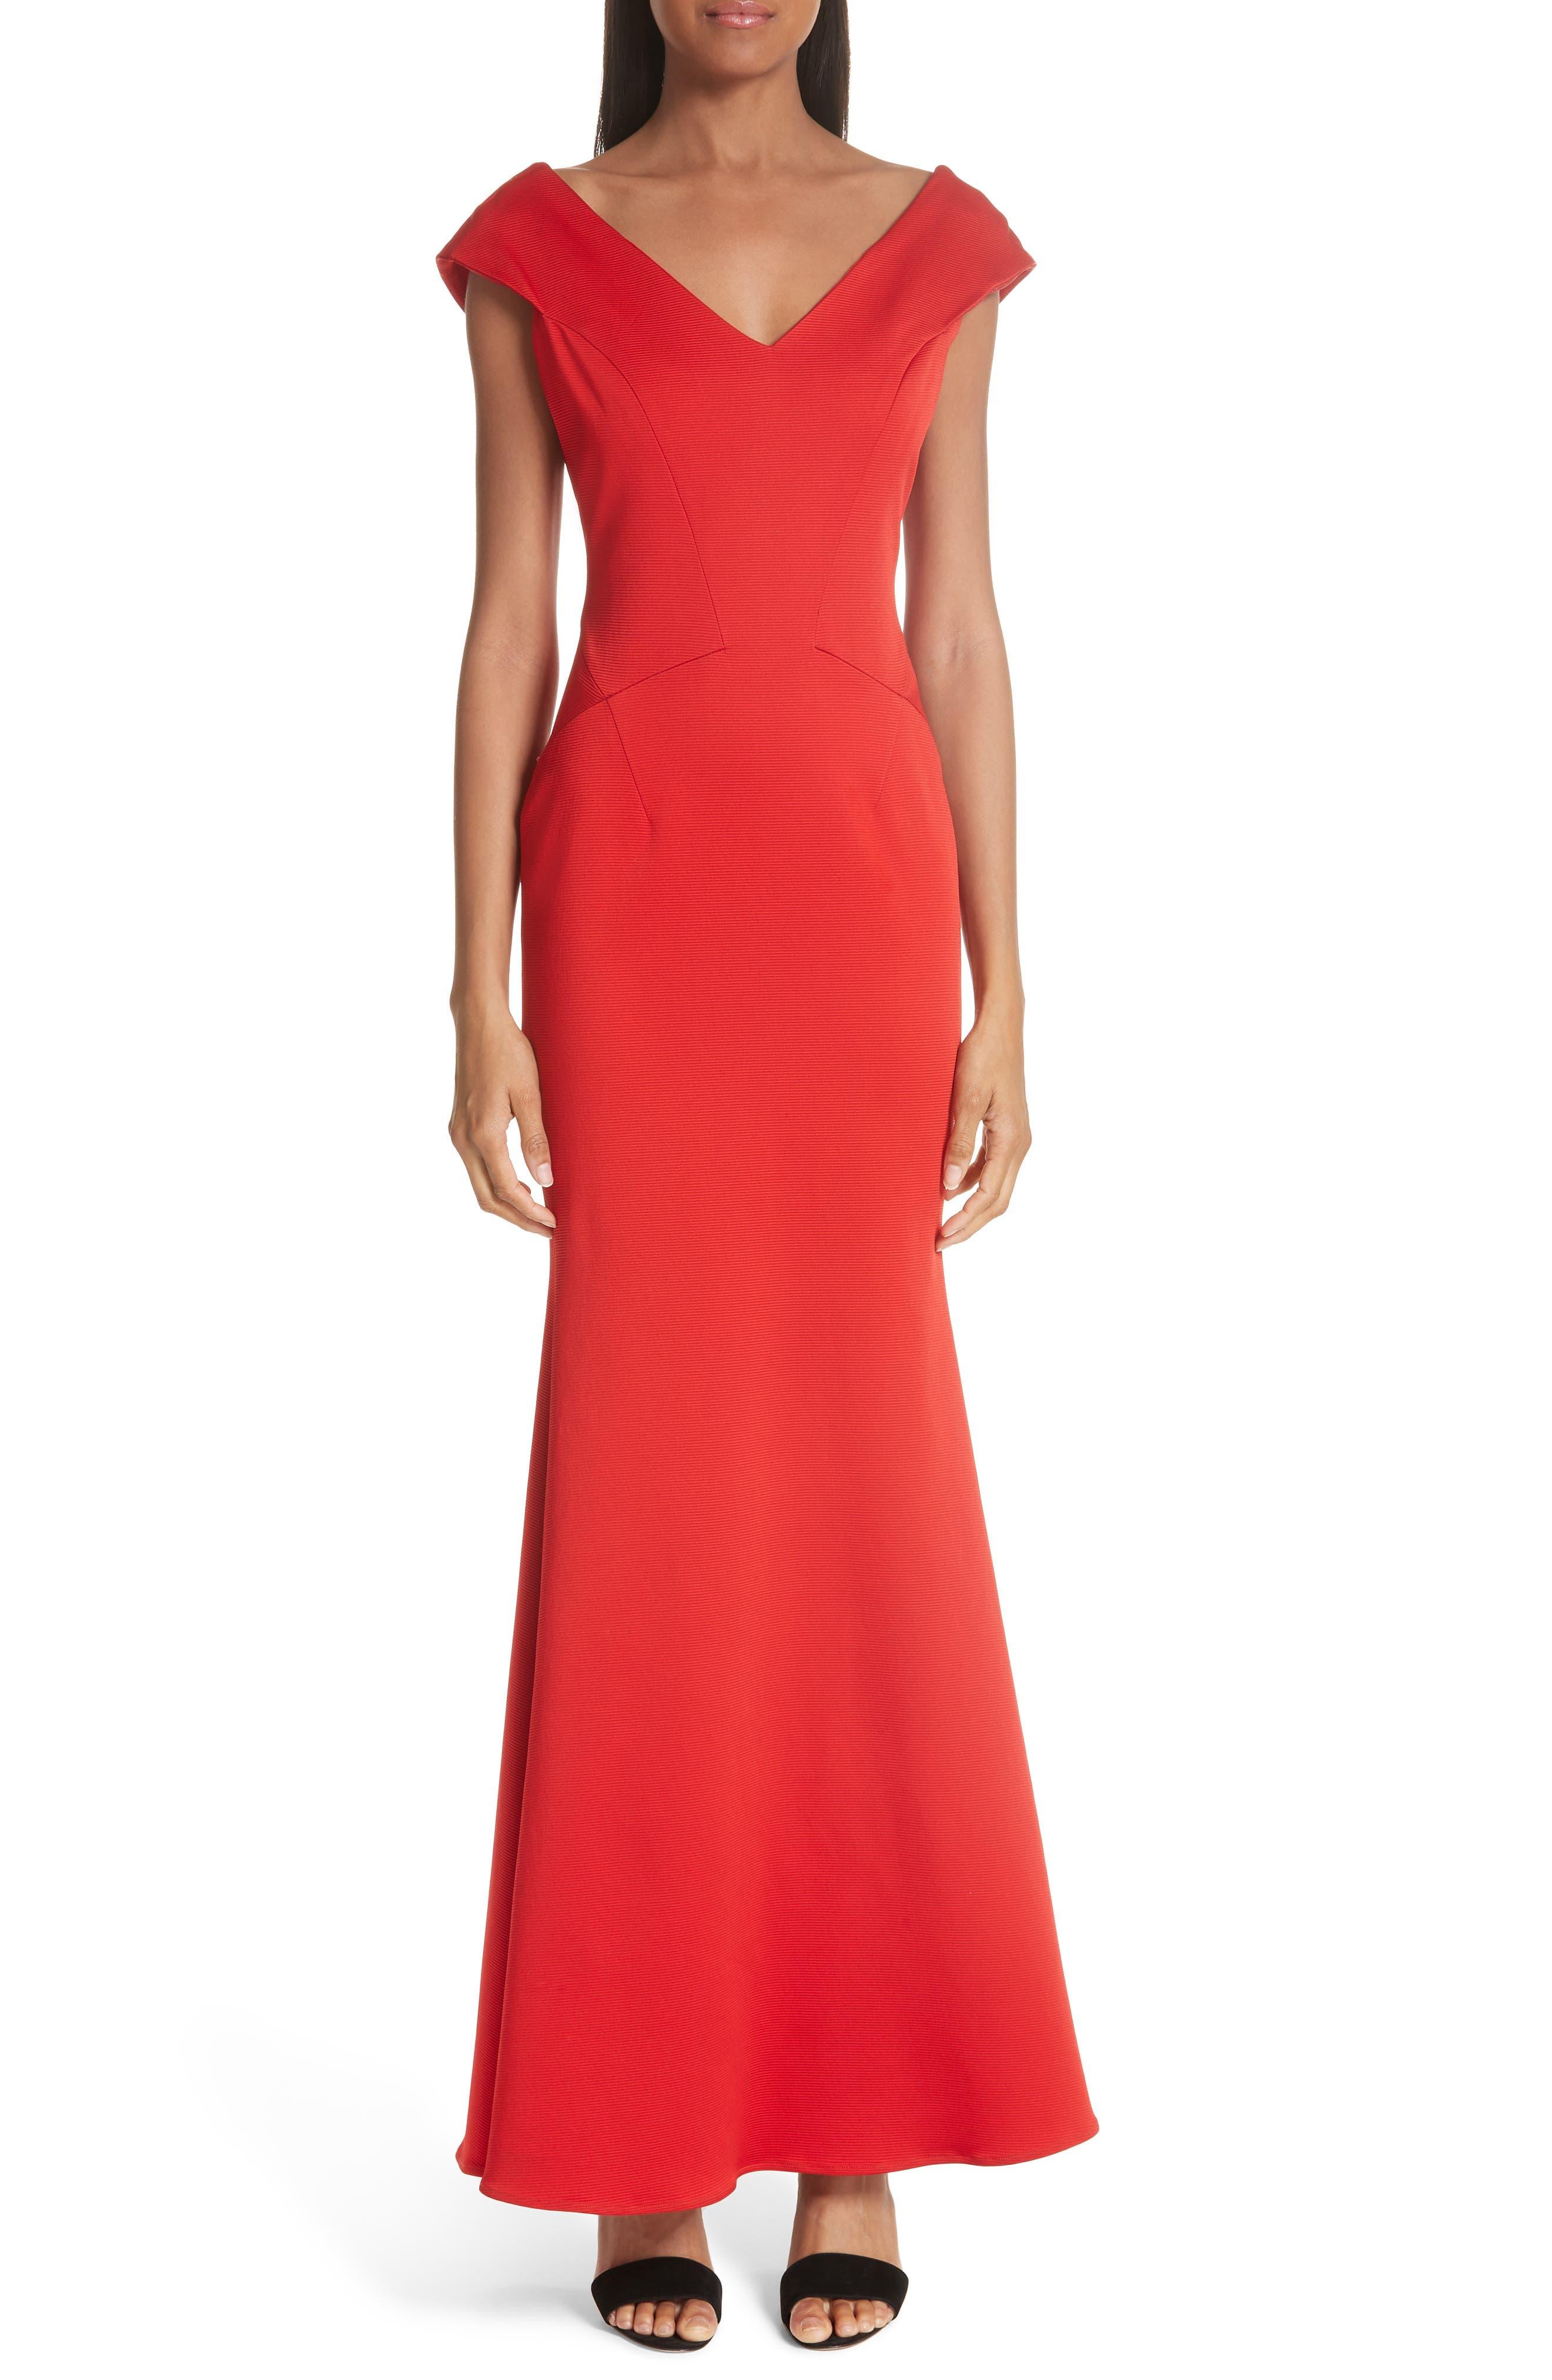 ZAC ZAC POSEN, Nina Trumpet Gown, Alternate thumbnail 6, color, RED